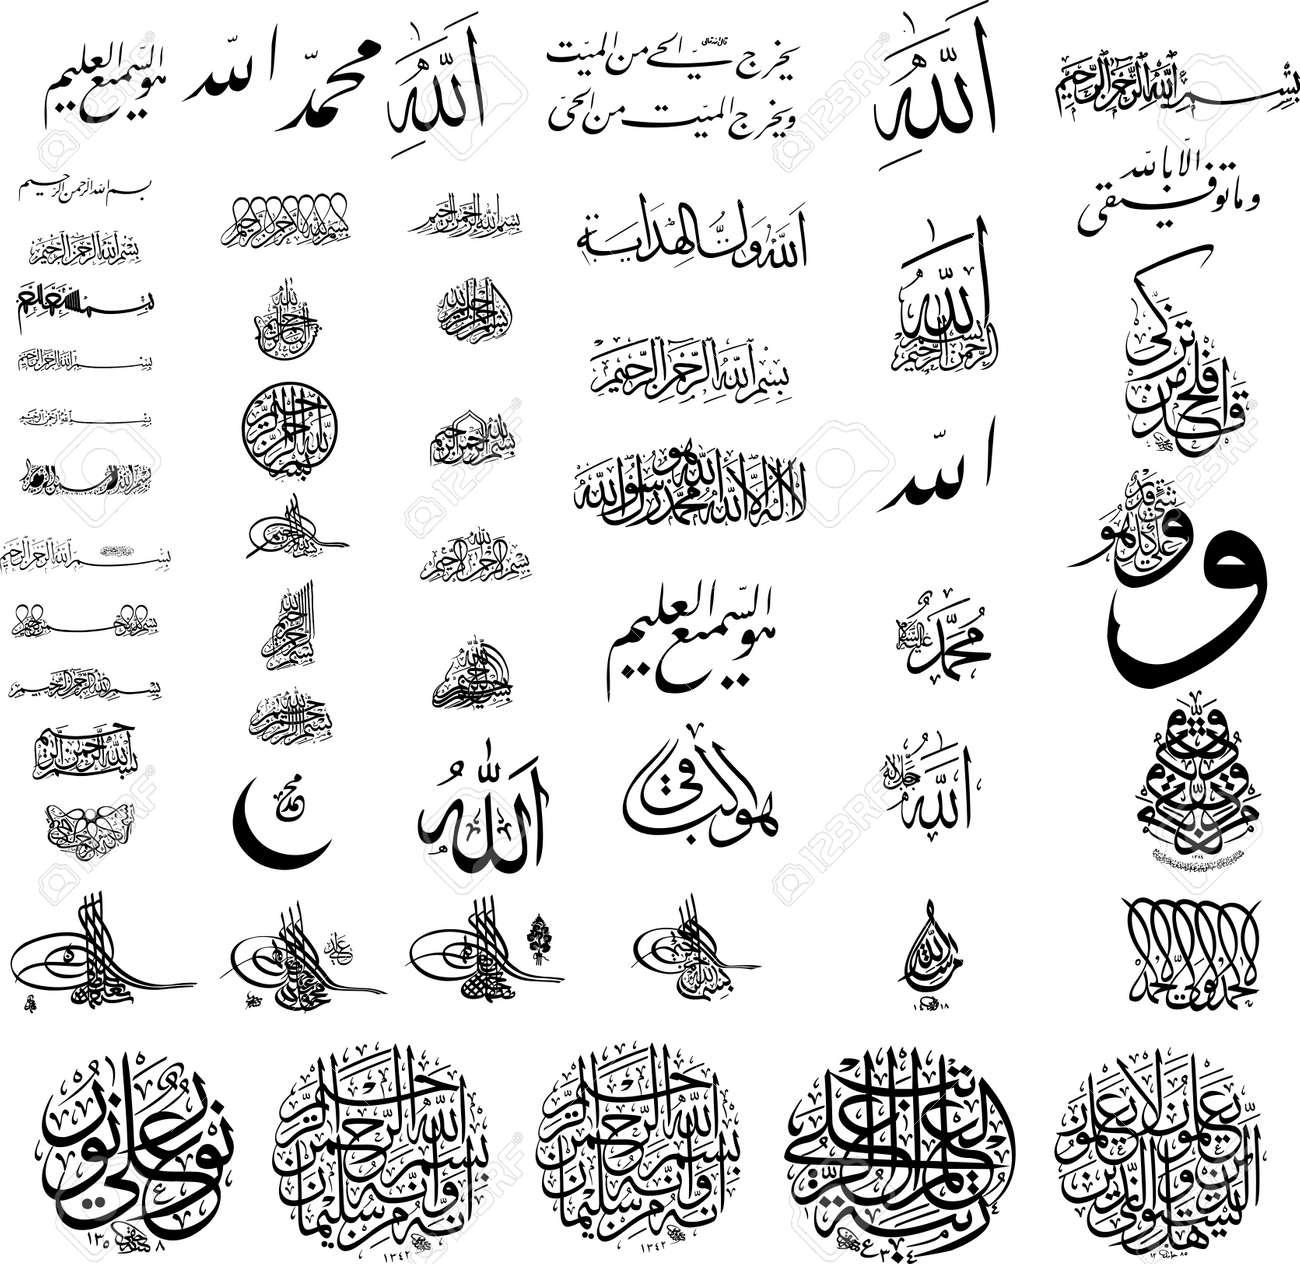 Symbols for writing